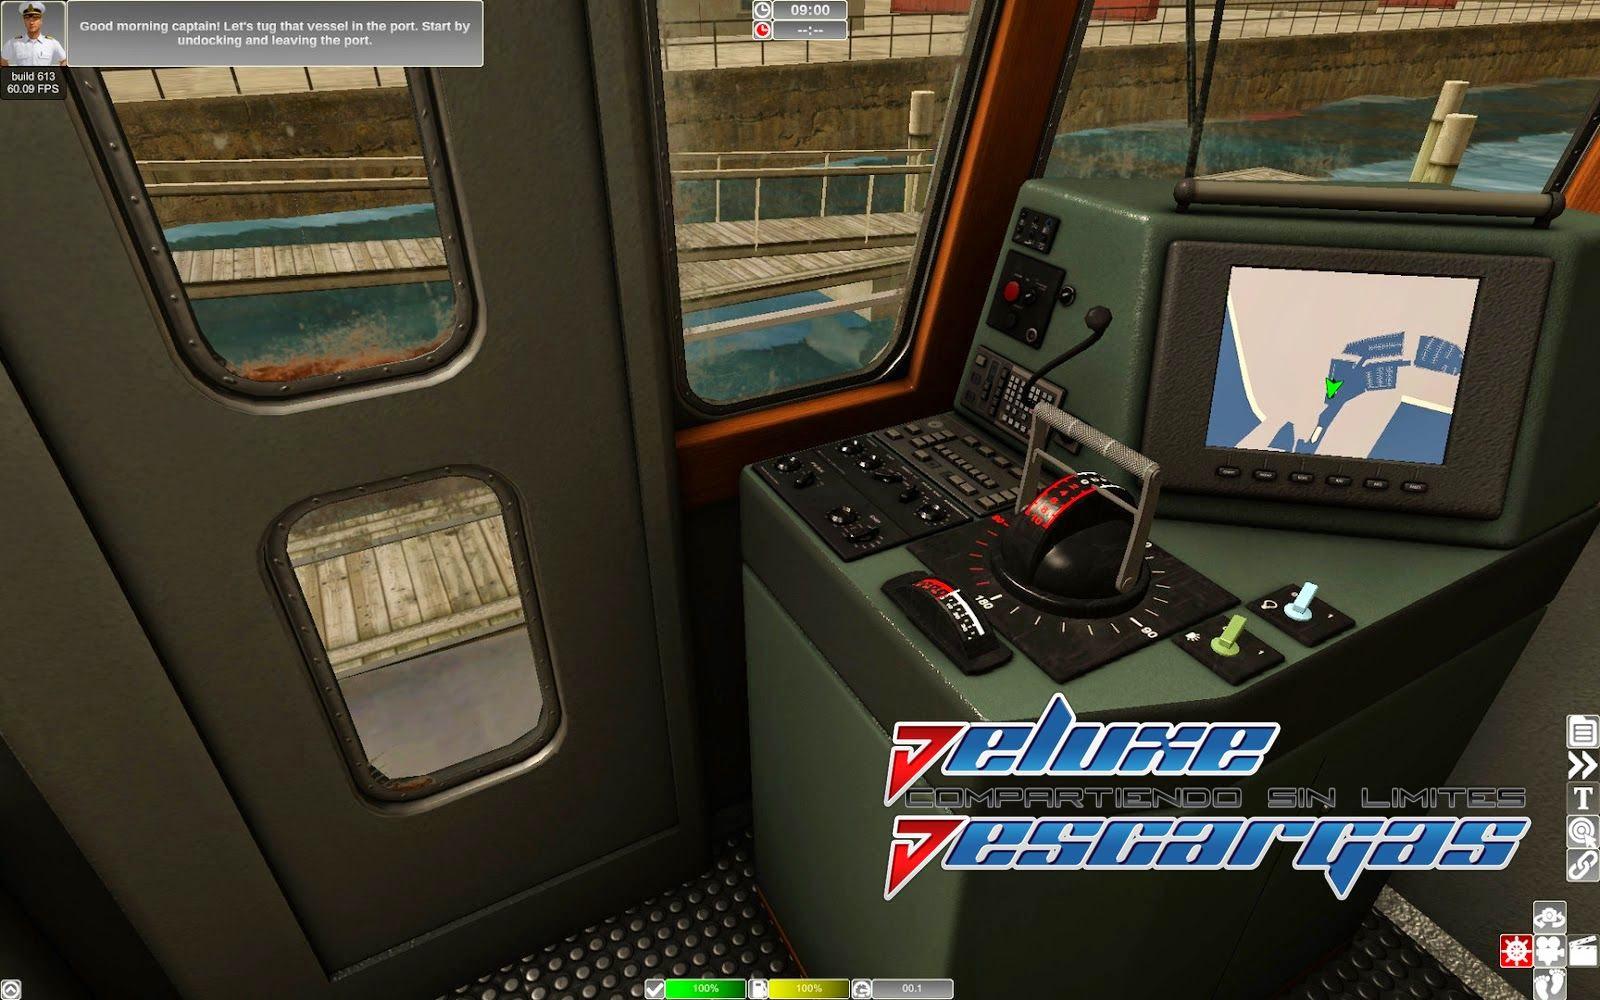 European_Ship_Simulator-www.deluxedescargas.com%2B(1).jpg